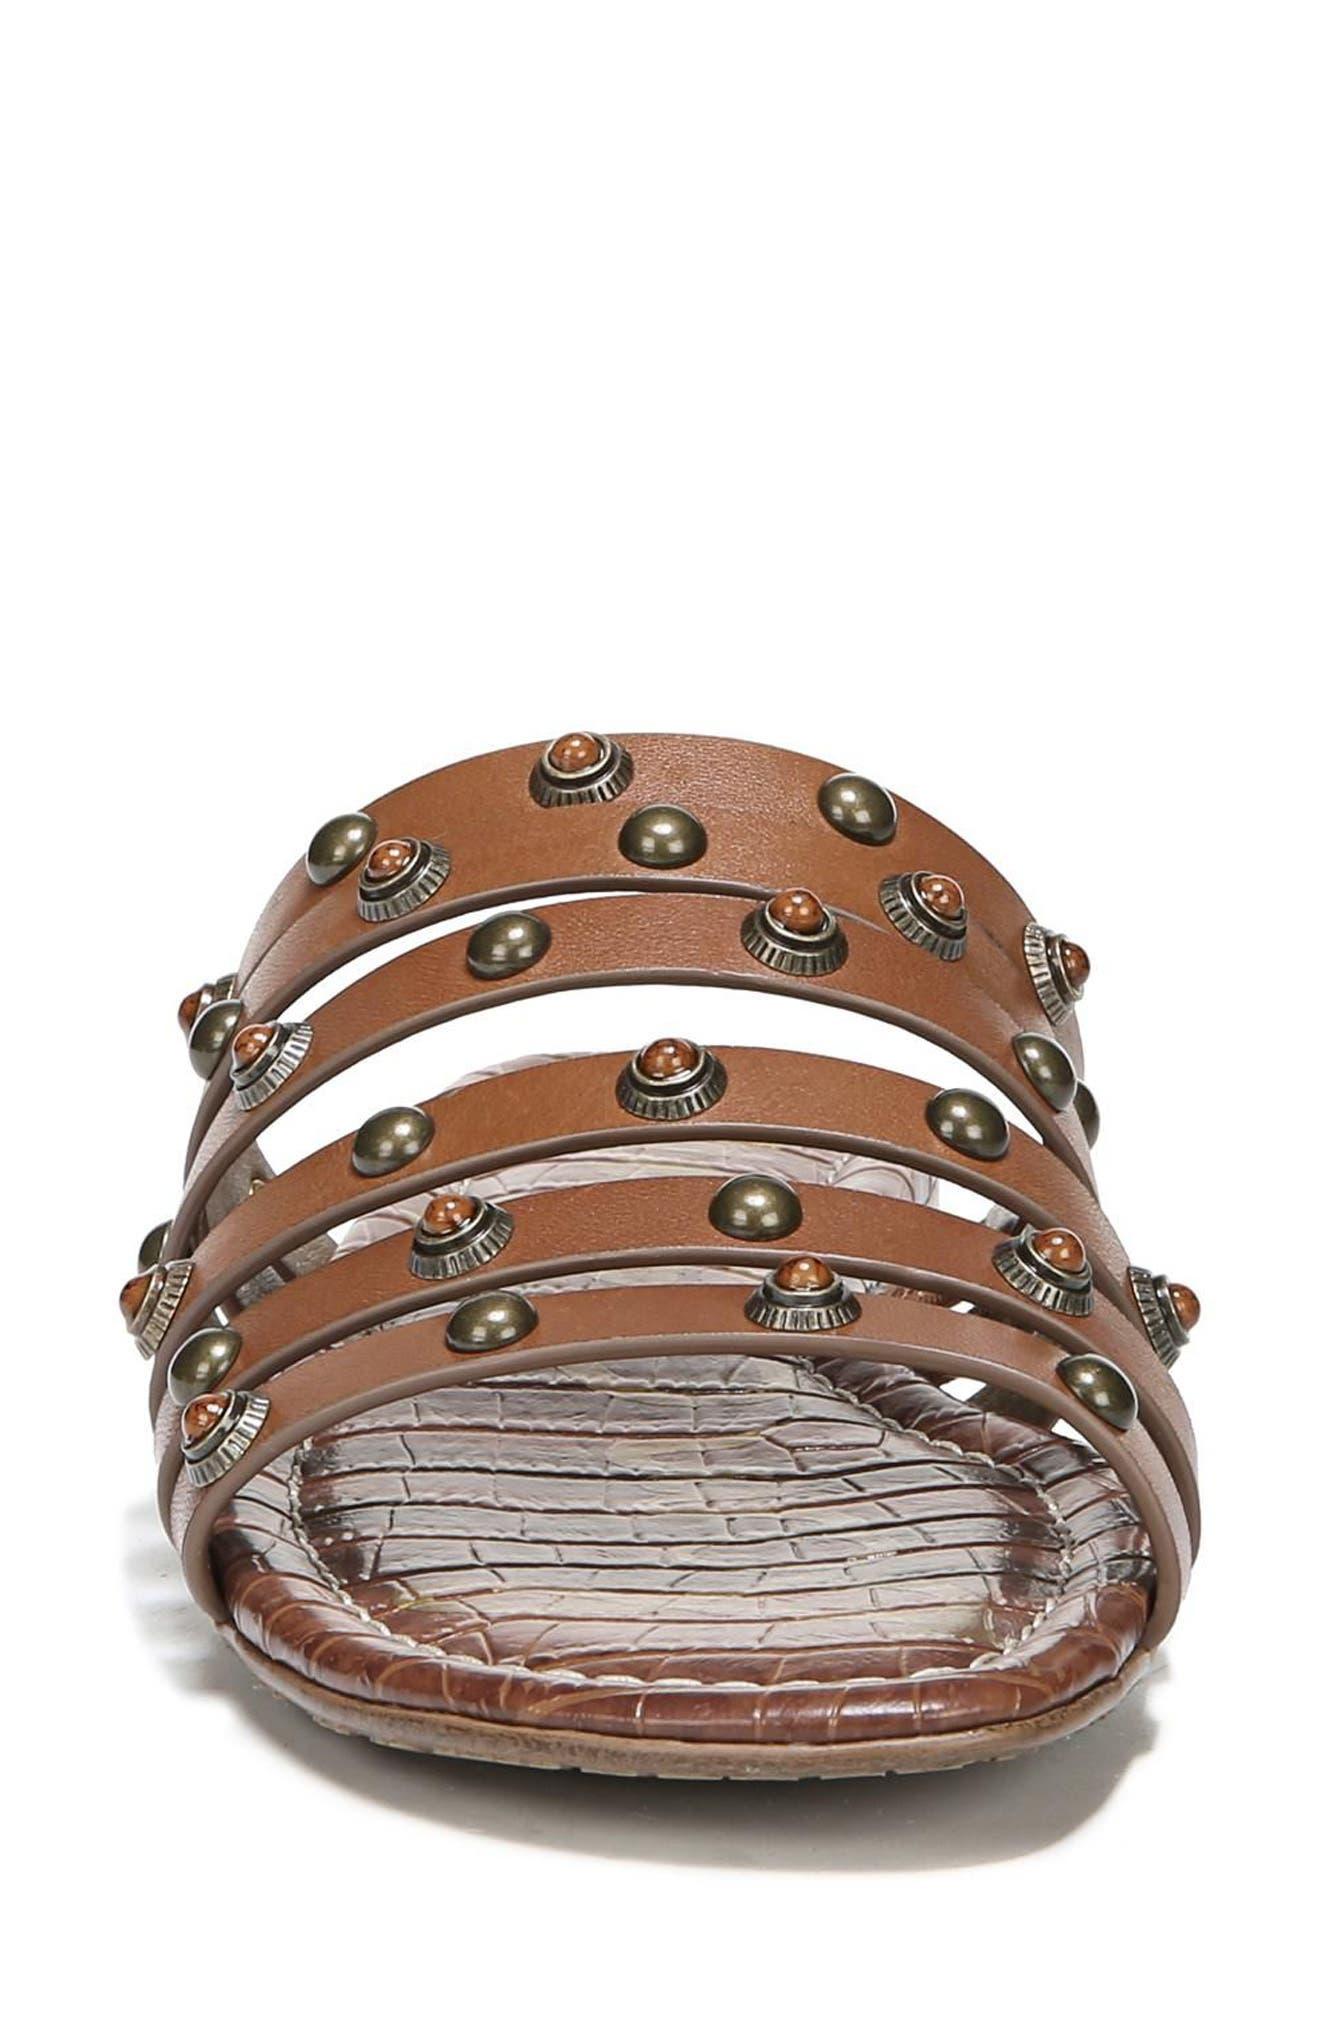 Brea Studded Slide Sandal,                             Alternate thumbnail 4, color,                             Luggage Leather